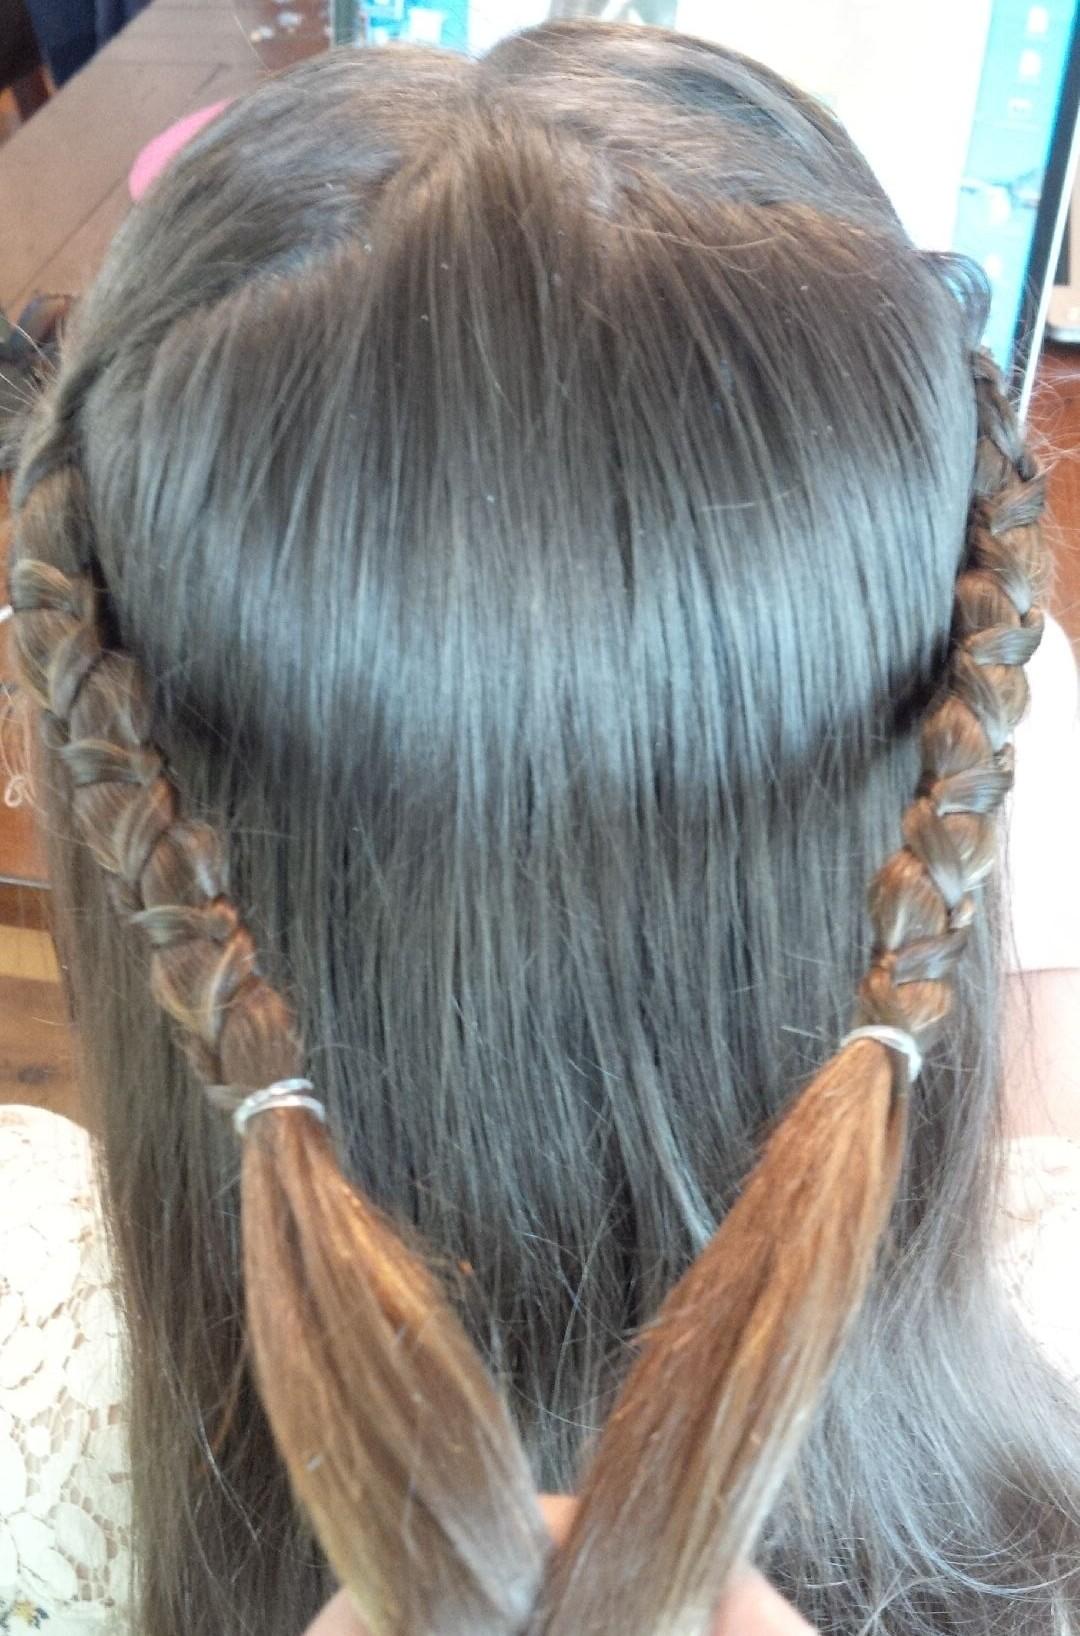 renaissance braid with knot | genuine girls club magazine